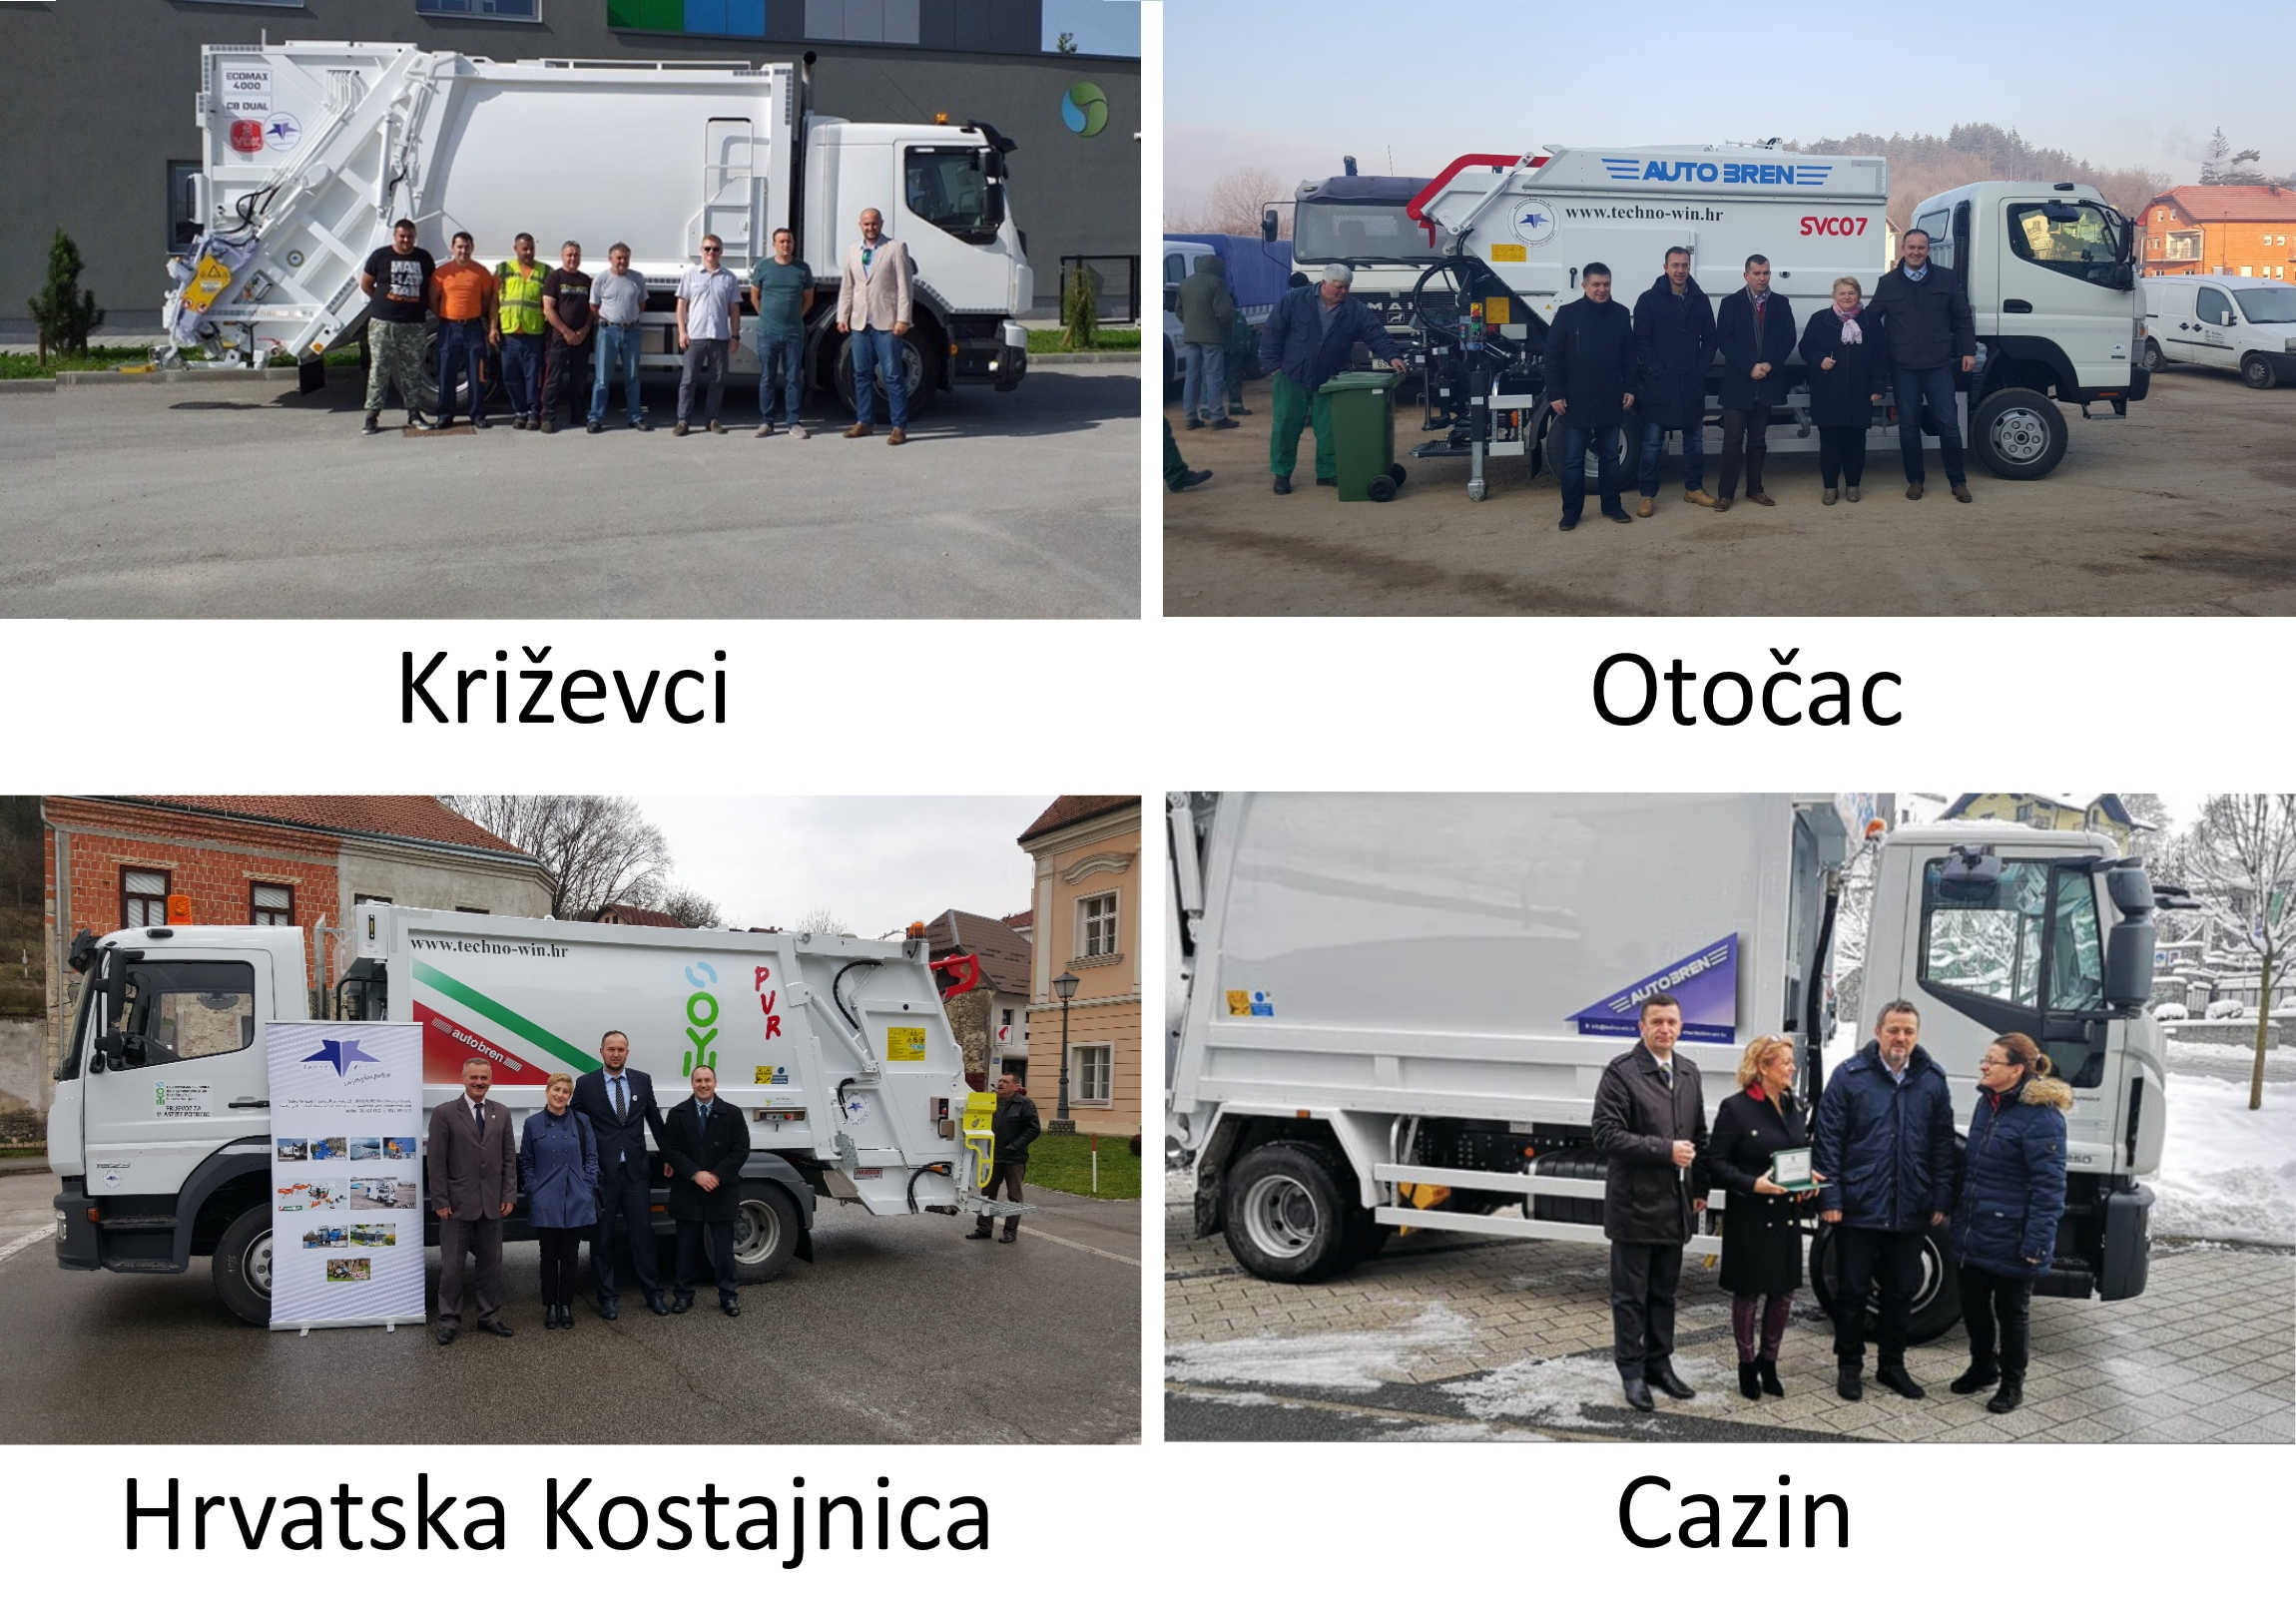 autobren, odvoz otpada, kamioni za odvoz otpada, selektiranje smeća